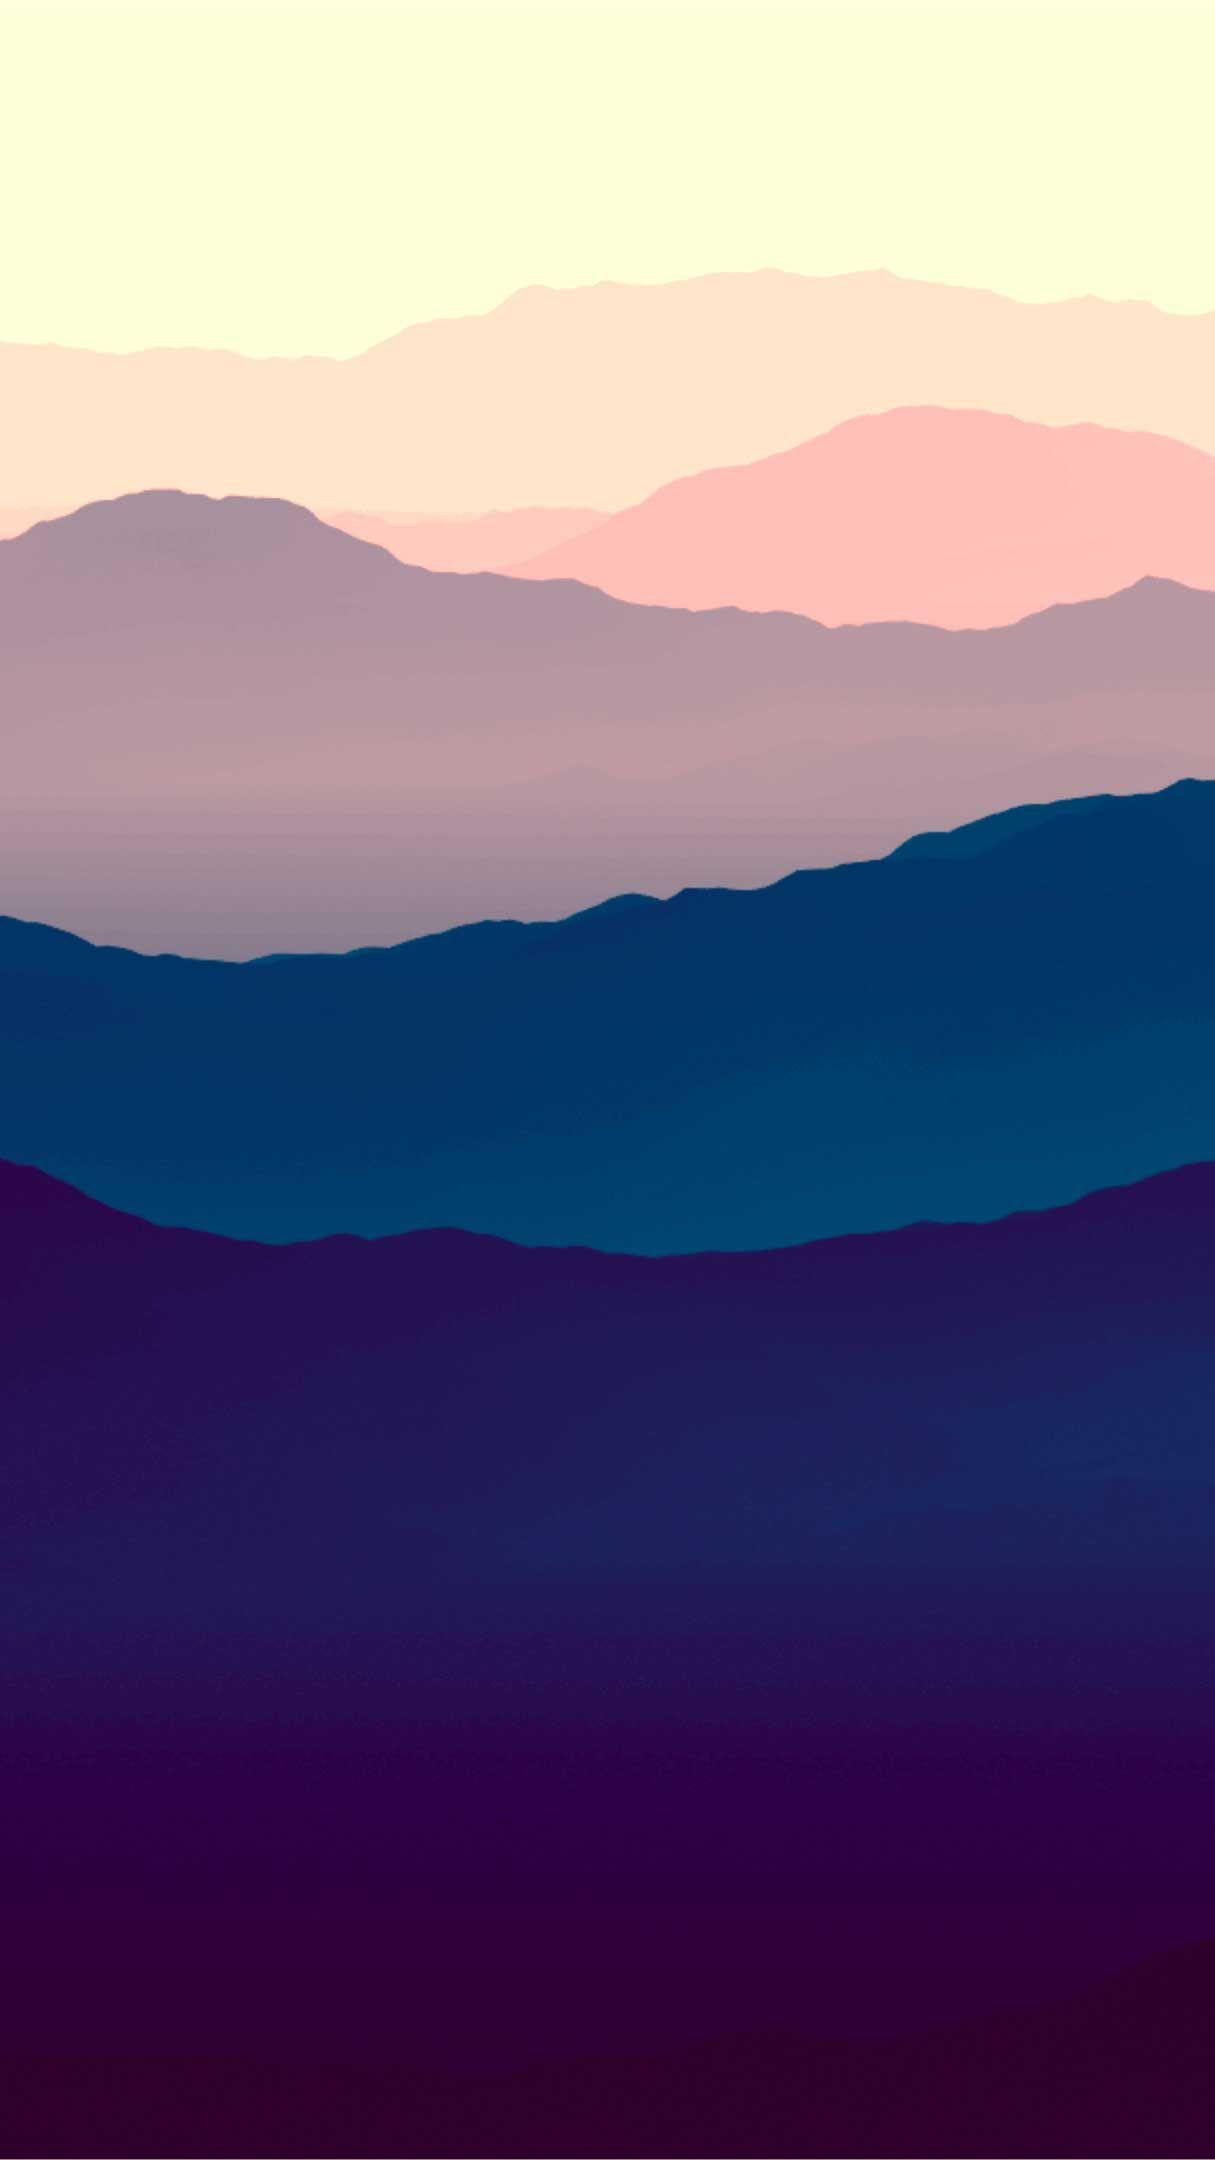 Mountains Landscape Purple Gradient Horizon Minimal Hd K Iphone Wallpapers Hd In 2020 Best Nature Wallpapers Iphone Wallpaper Ocean Nature Wallpaper